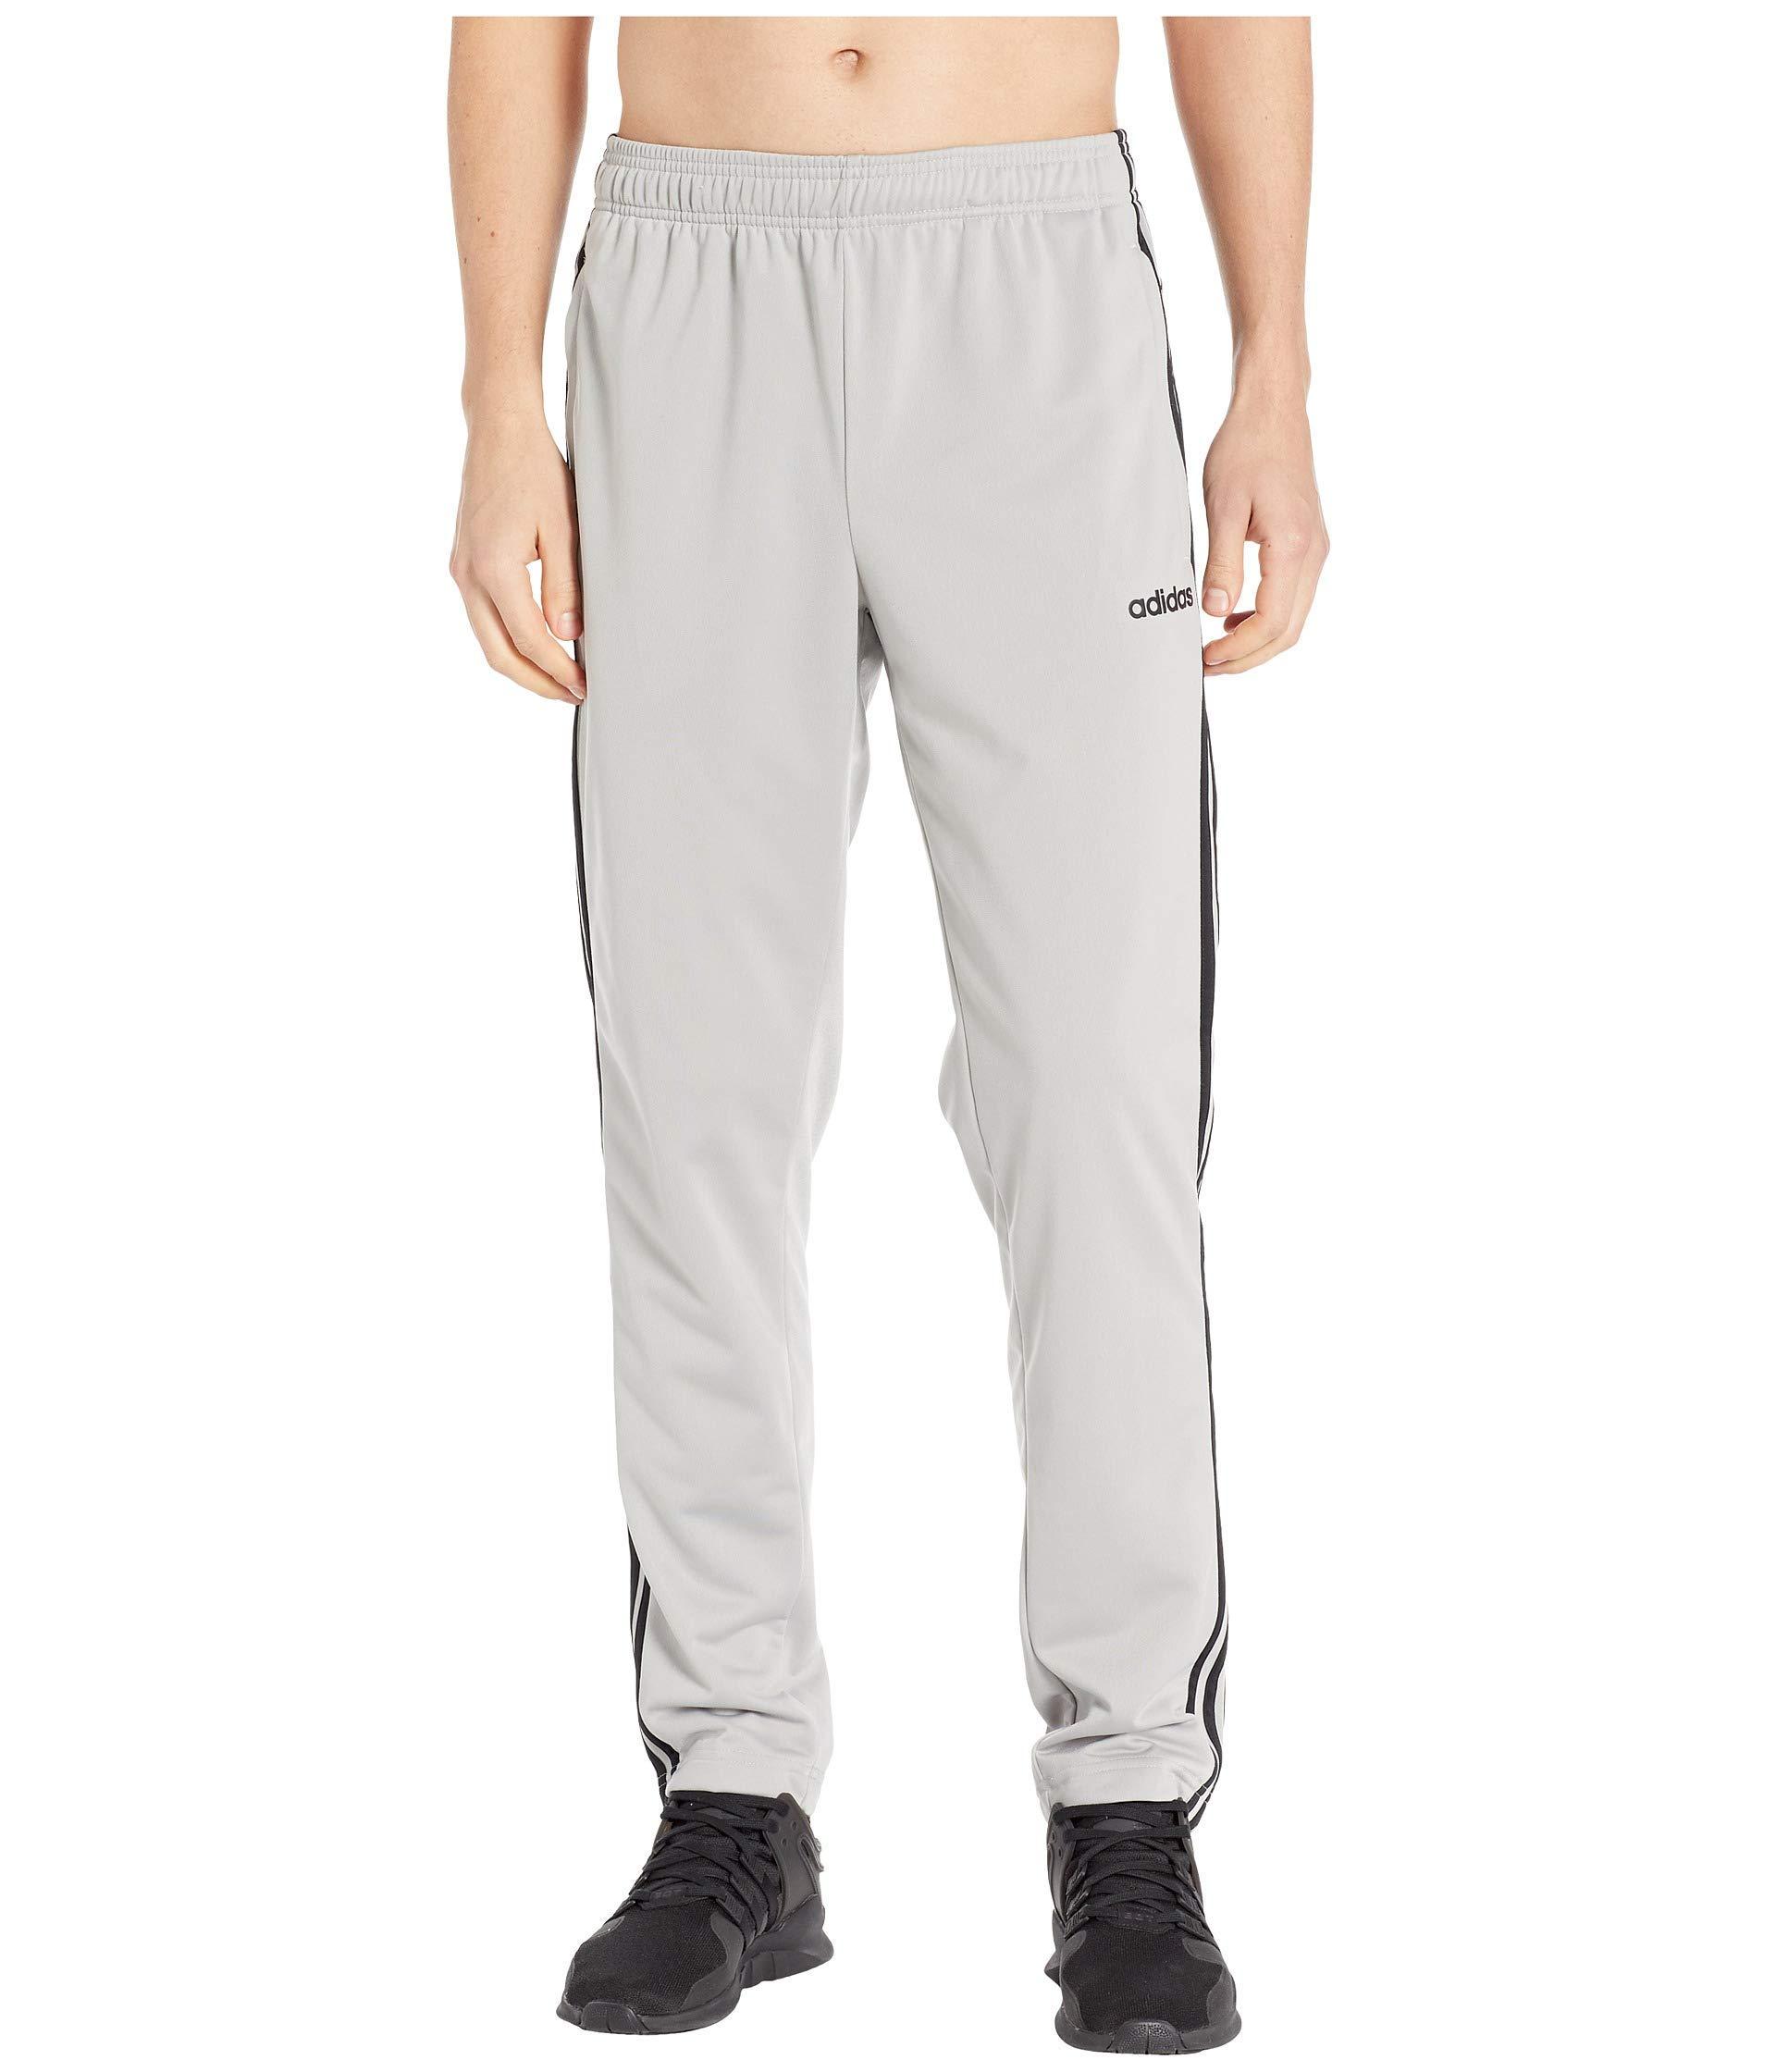 adidas Men's Essentials 3-Stripe Tricot Pant Tapered Medium Grey Heather/Black X-Large 32 by adidas